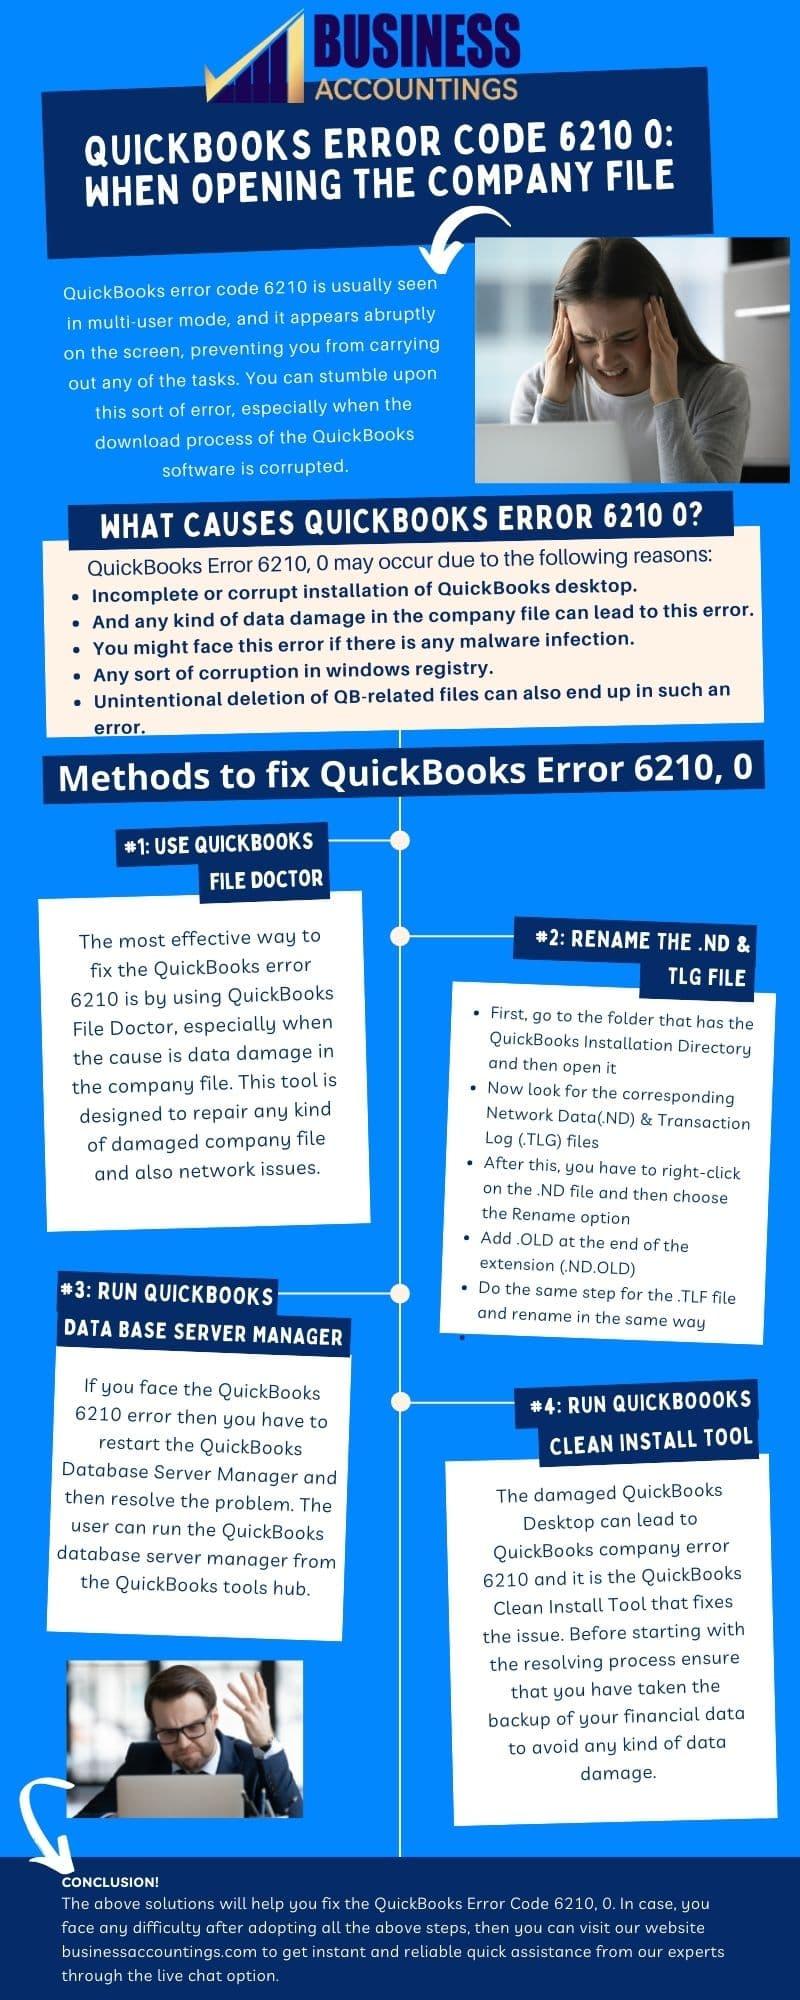 Infographic To Fix QuickBooks Error 6210, 0